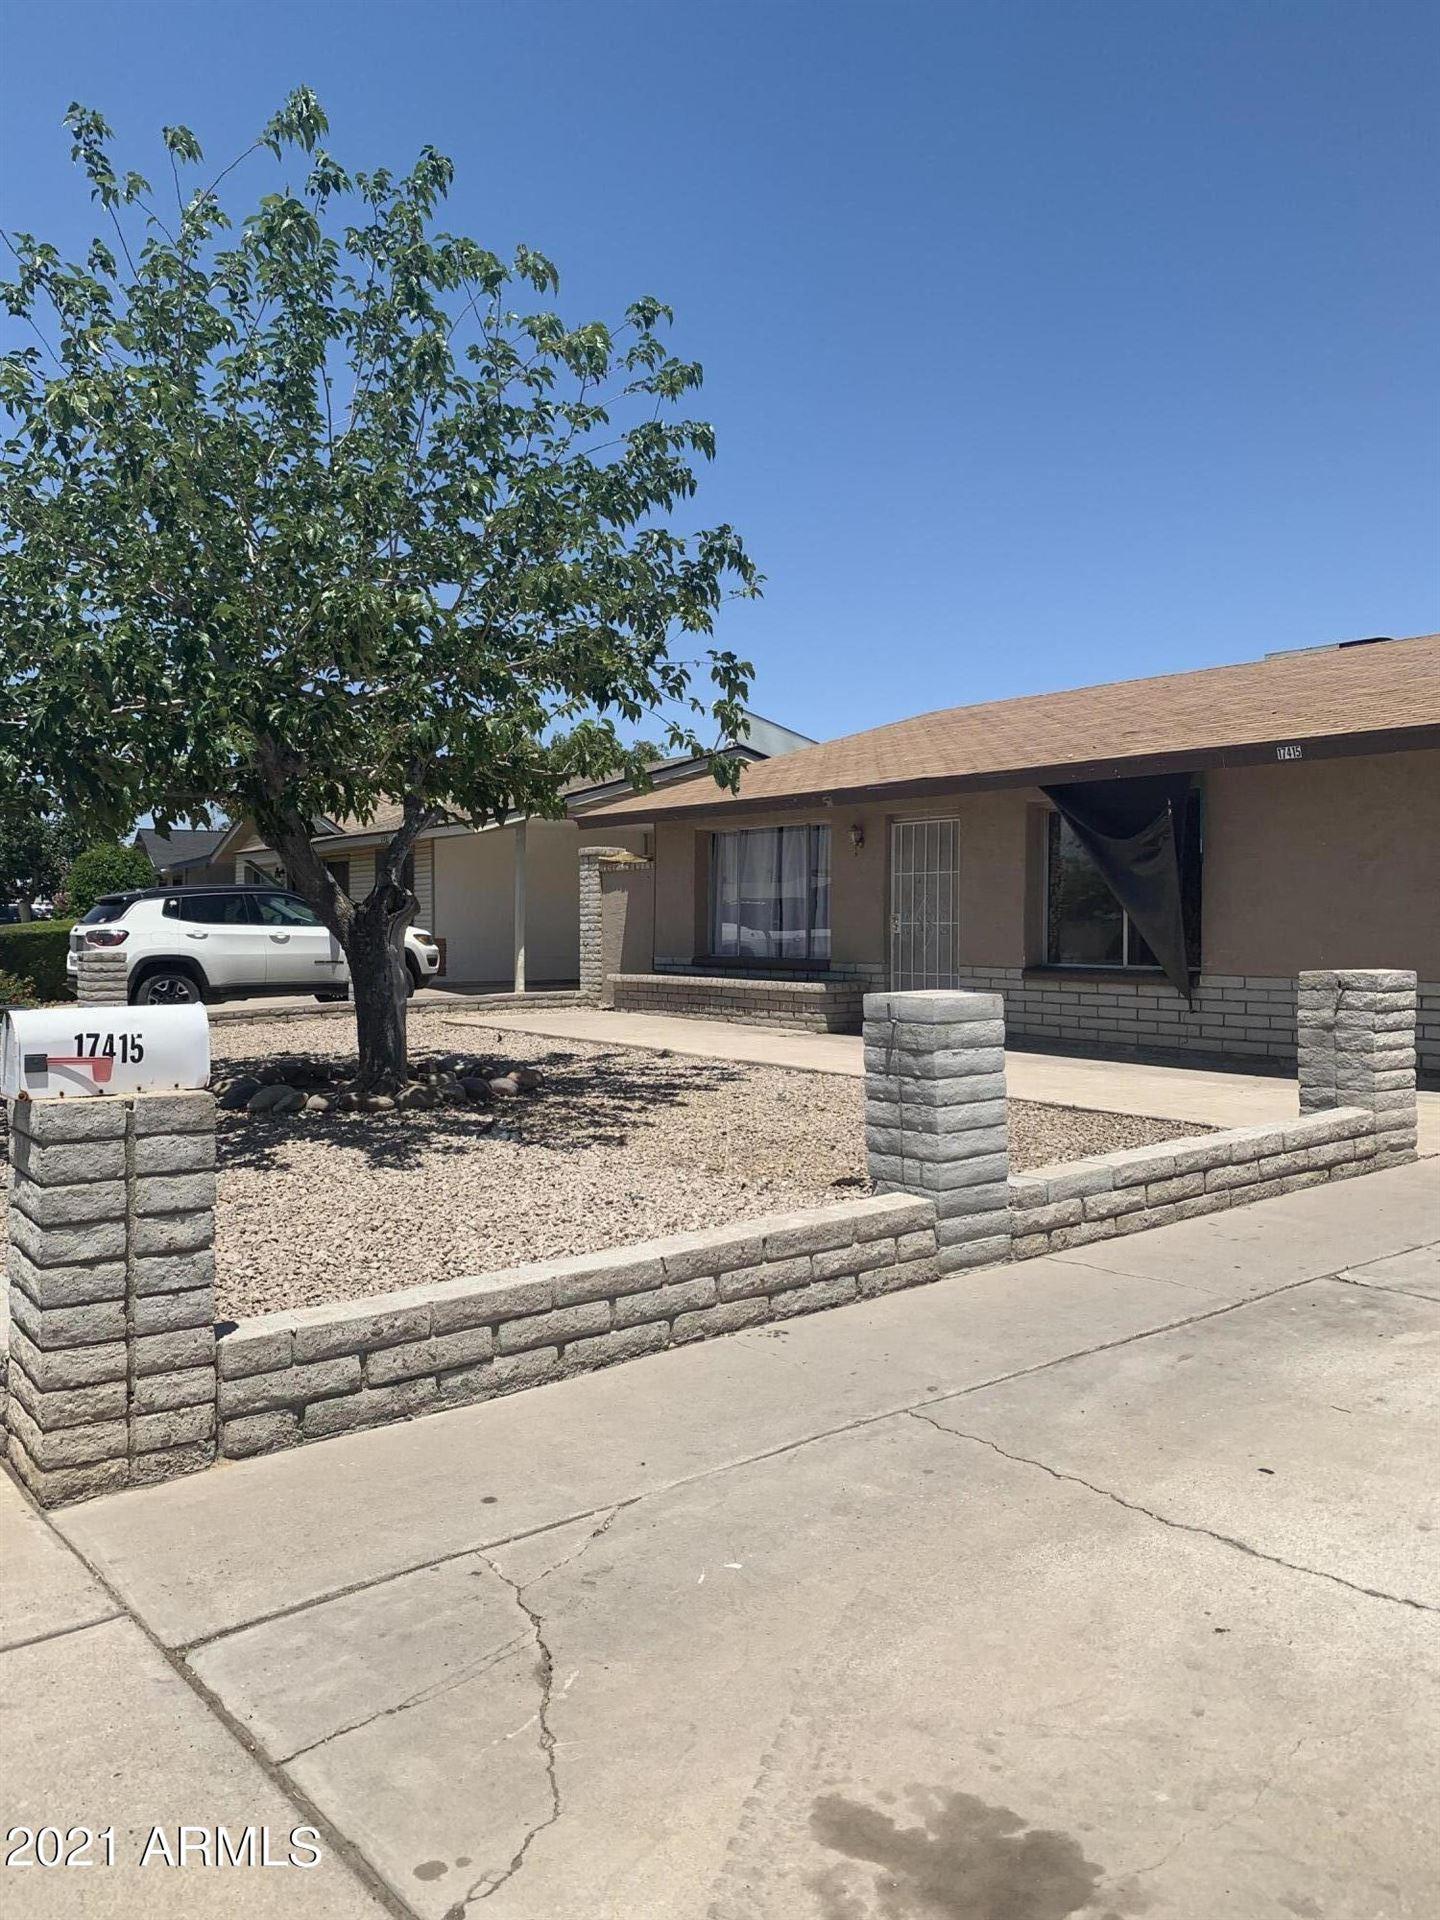 17415 N 14TH Avenue, Phoenix, AZ 85023 - MLS#: 6250773